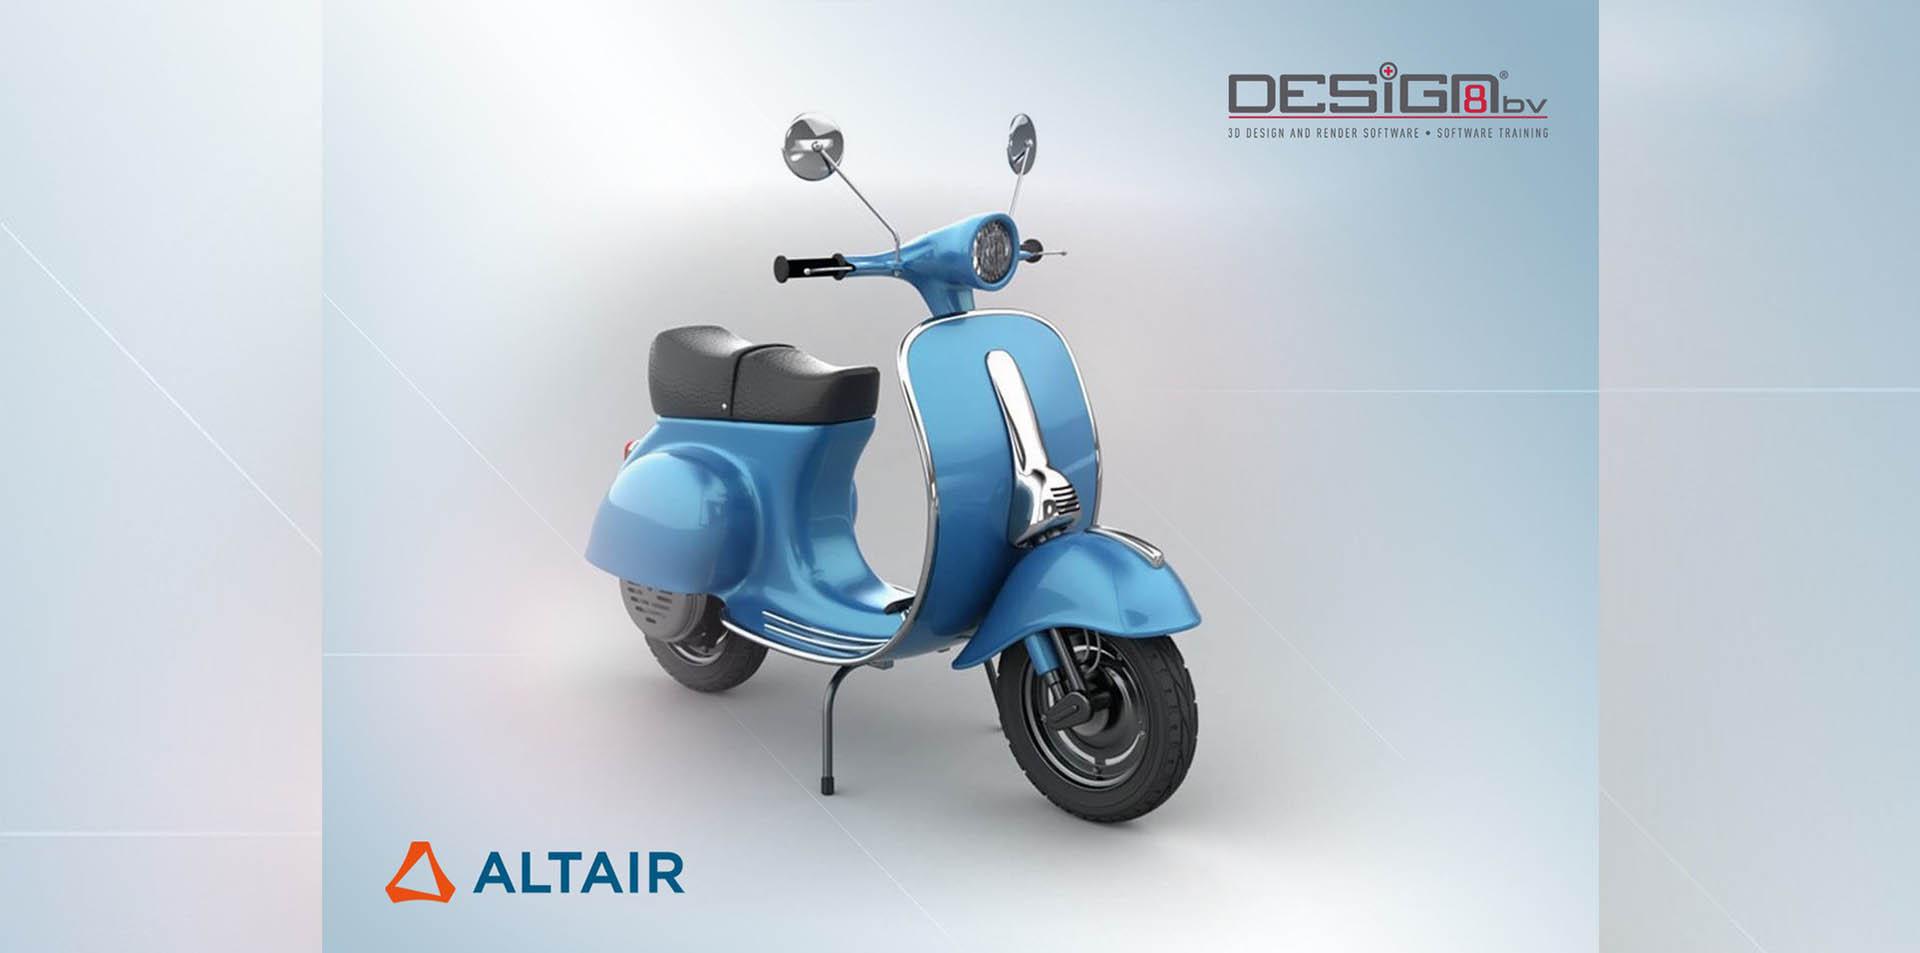 ALtair Inspire Platform